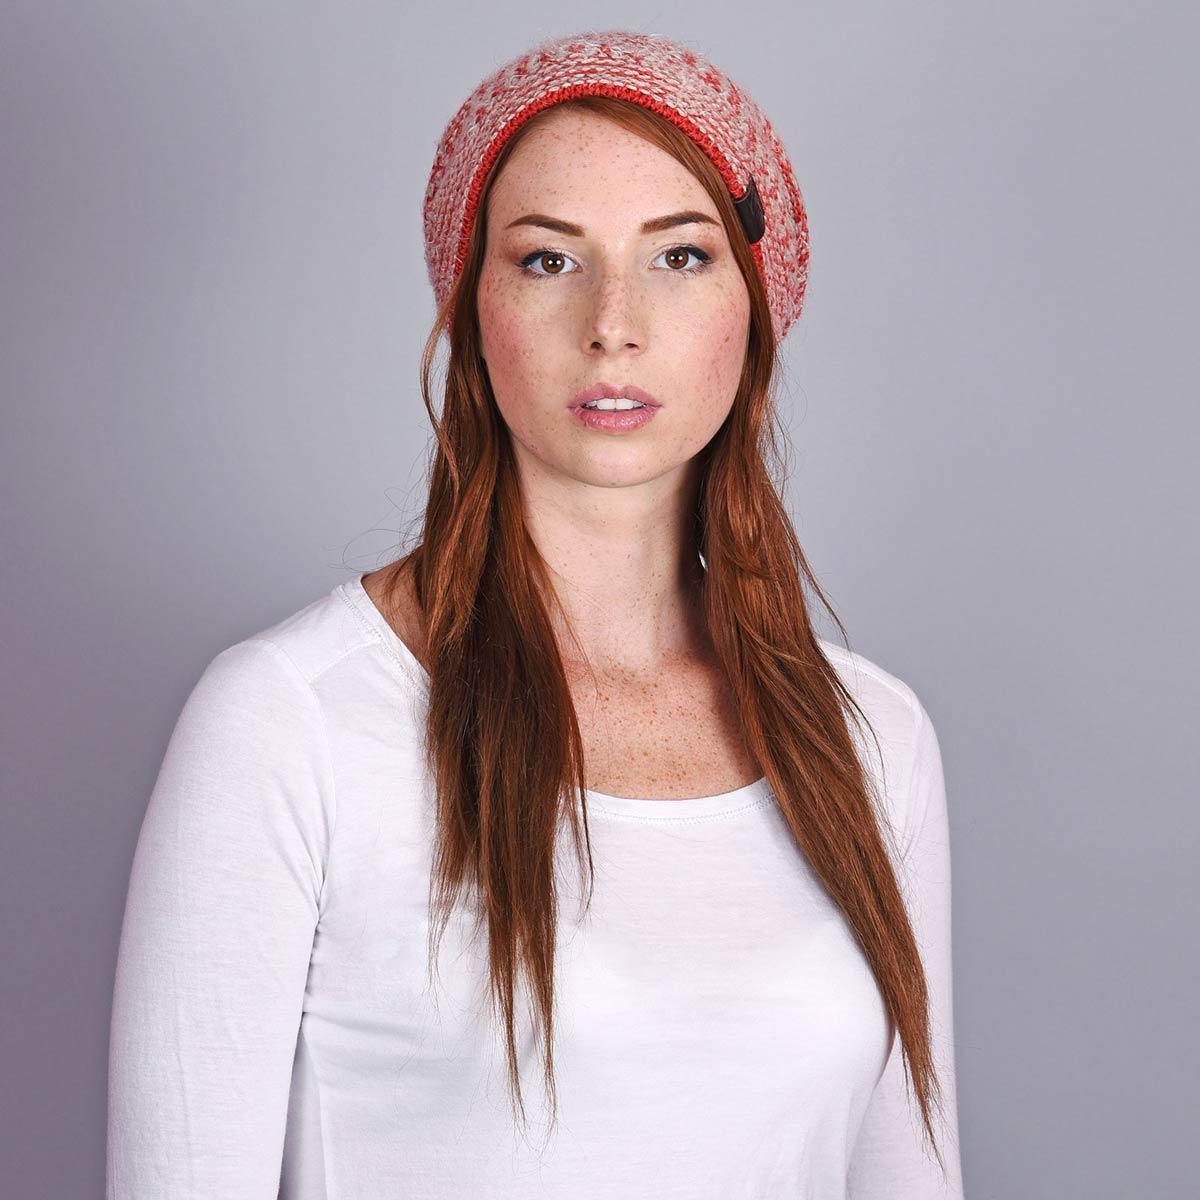 CP-01153-W12-2-bonnet-long-tendance-rouge